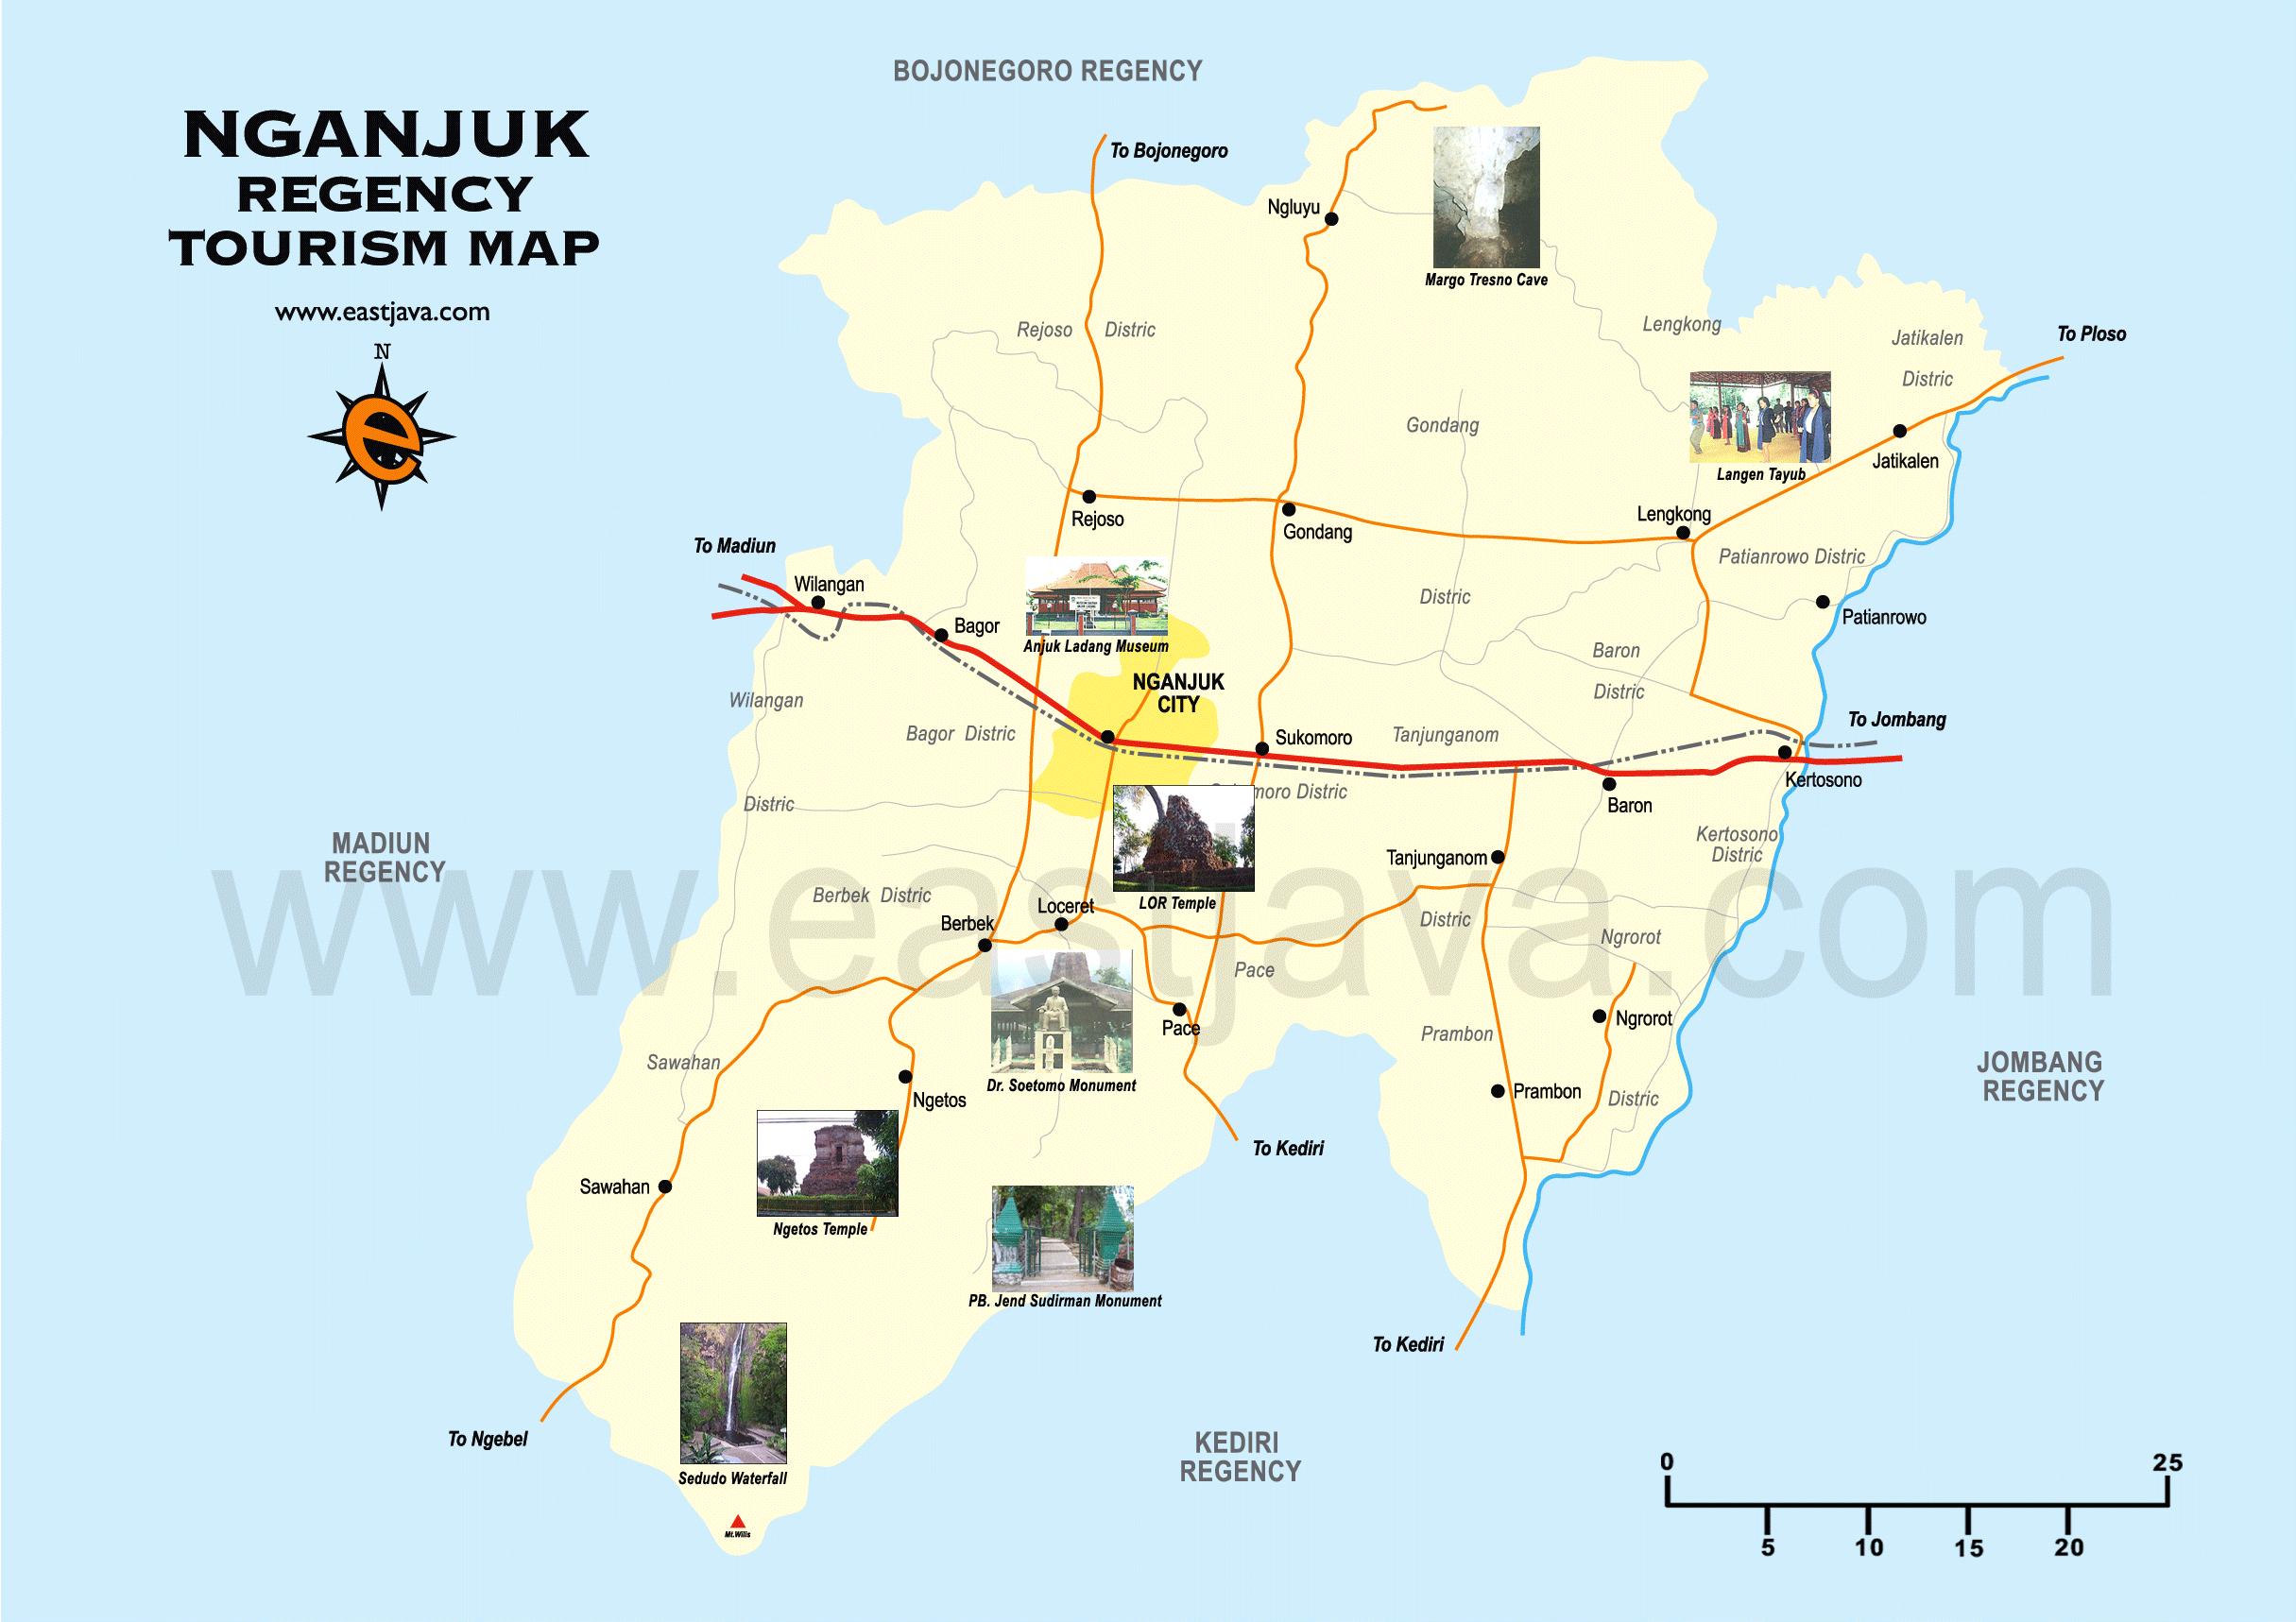 Mengenal Kota Nganjuk Francichandra Blog Kabupaten Monumen Geriliya Jenderal Sudirman